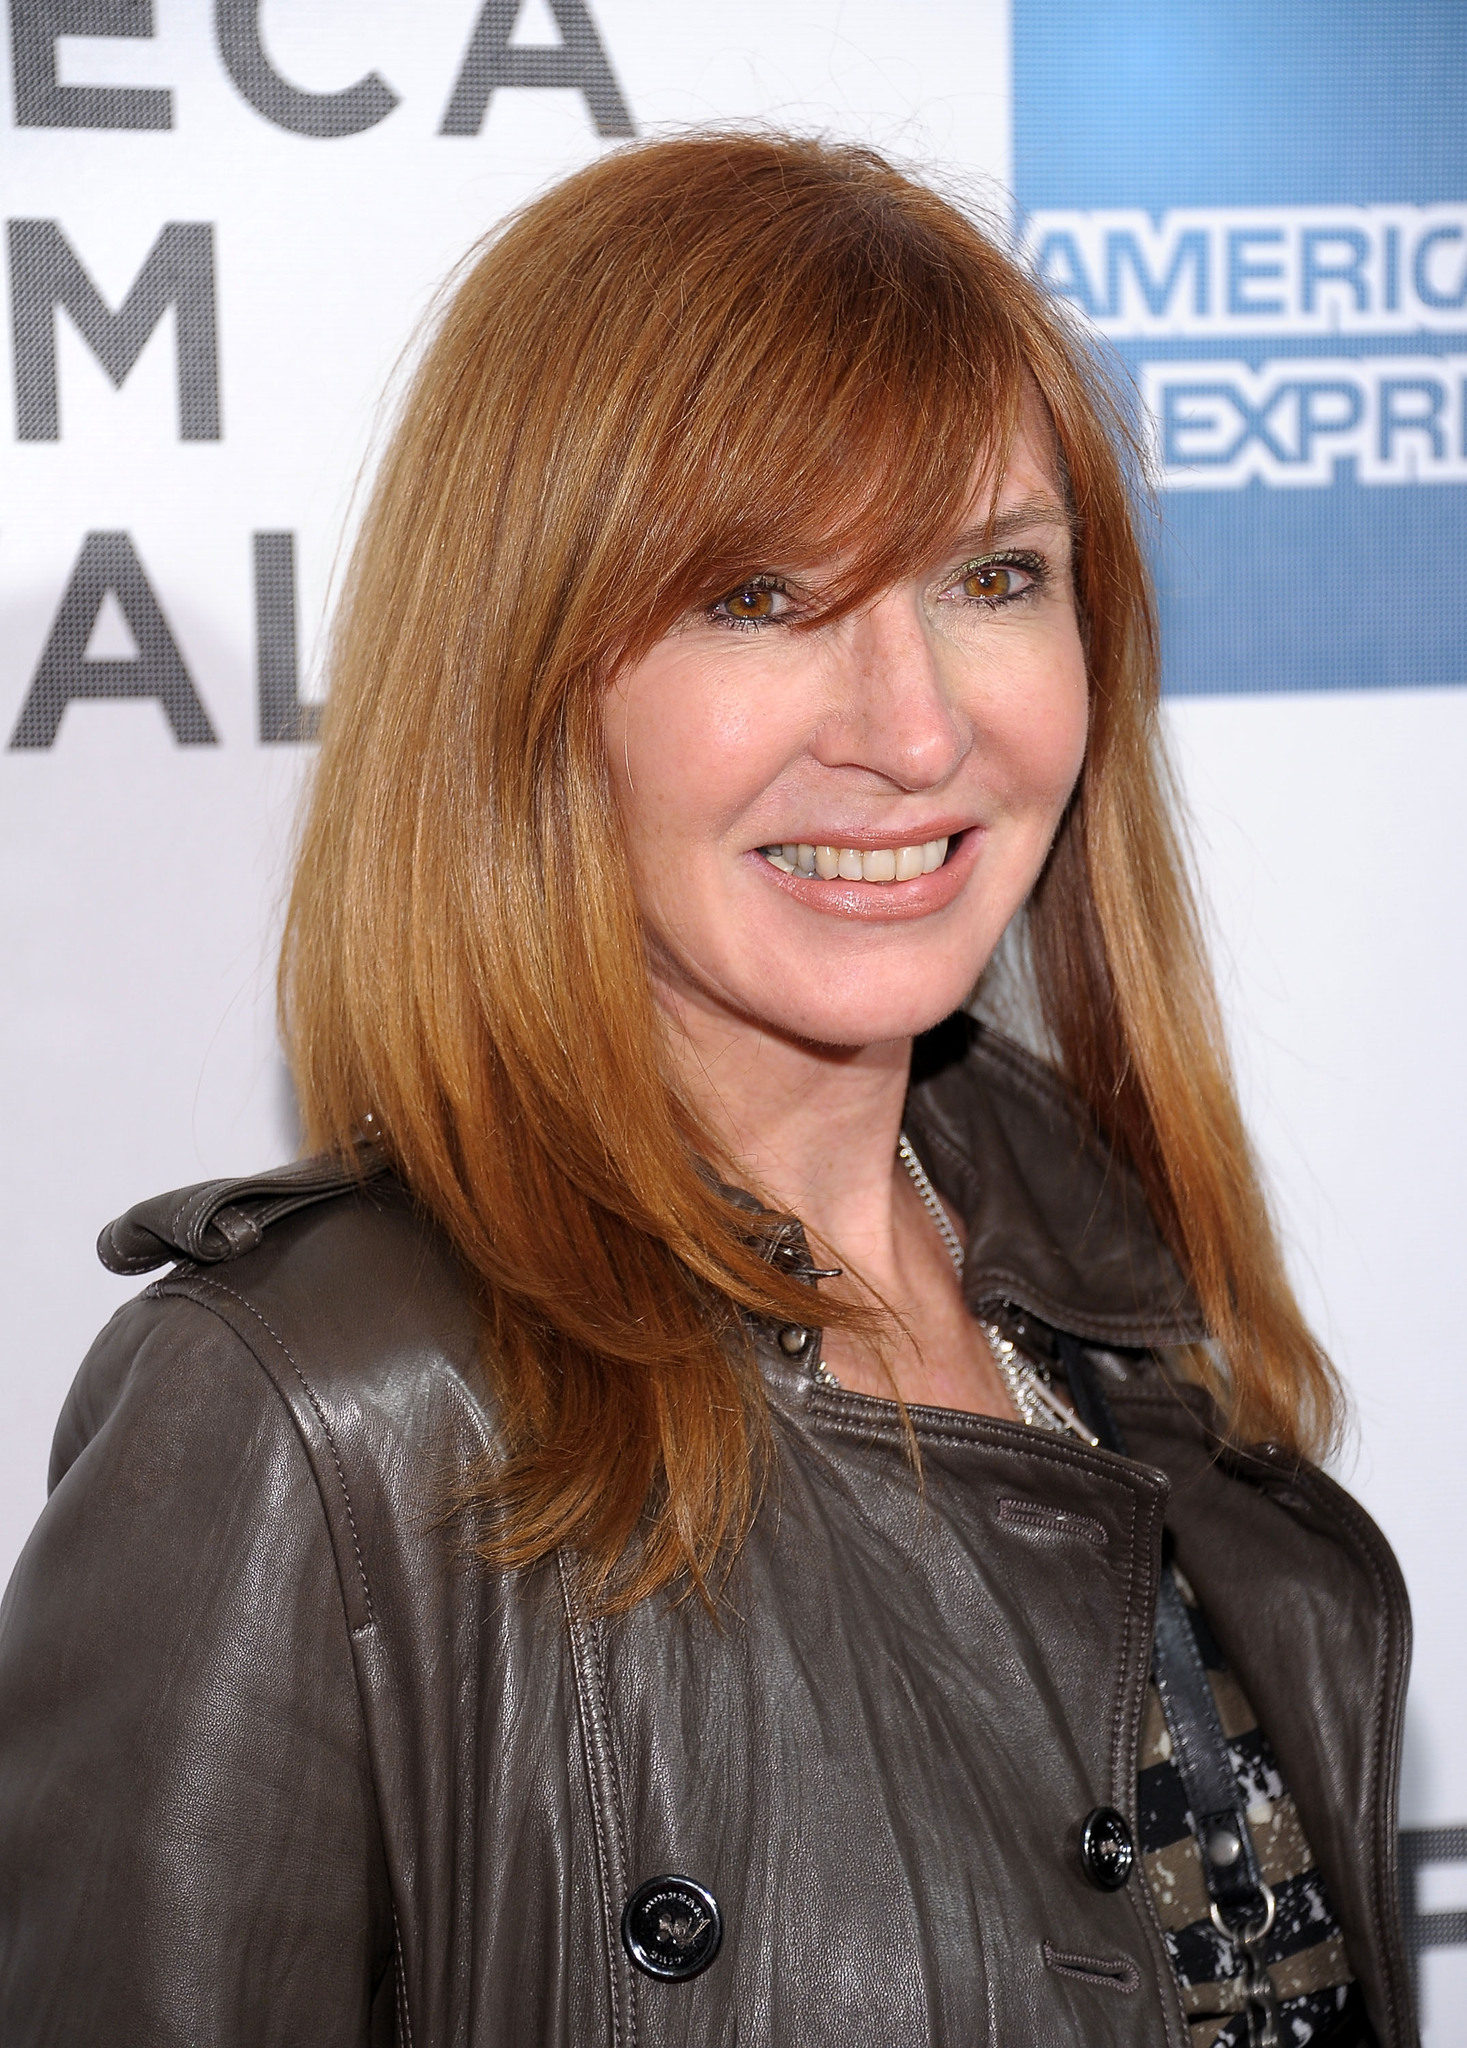 Nicole Miller at event of The Bang Bang Club (2010)